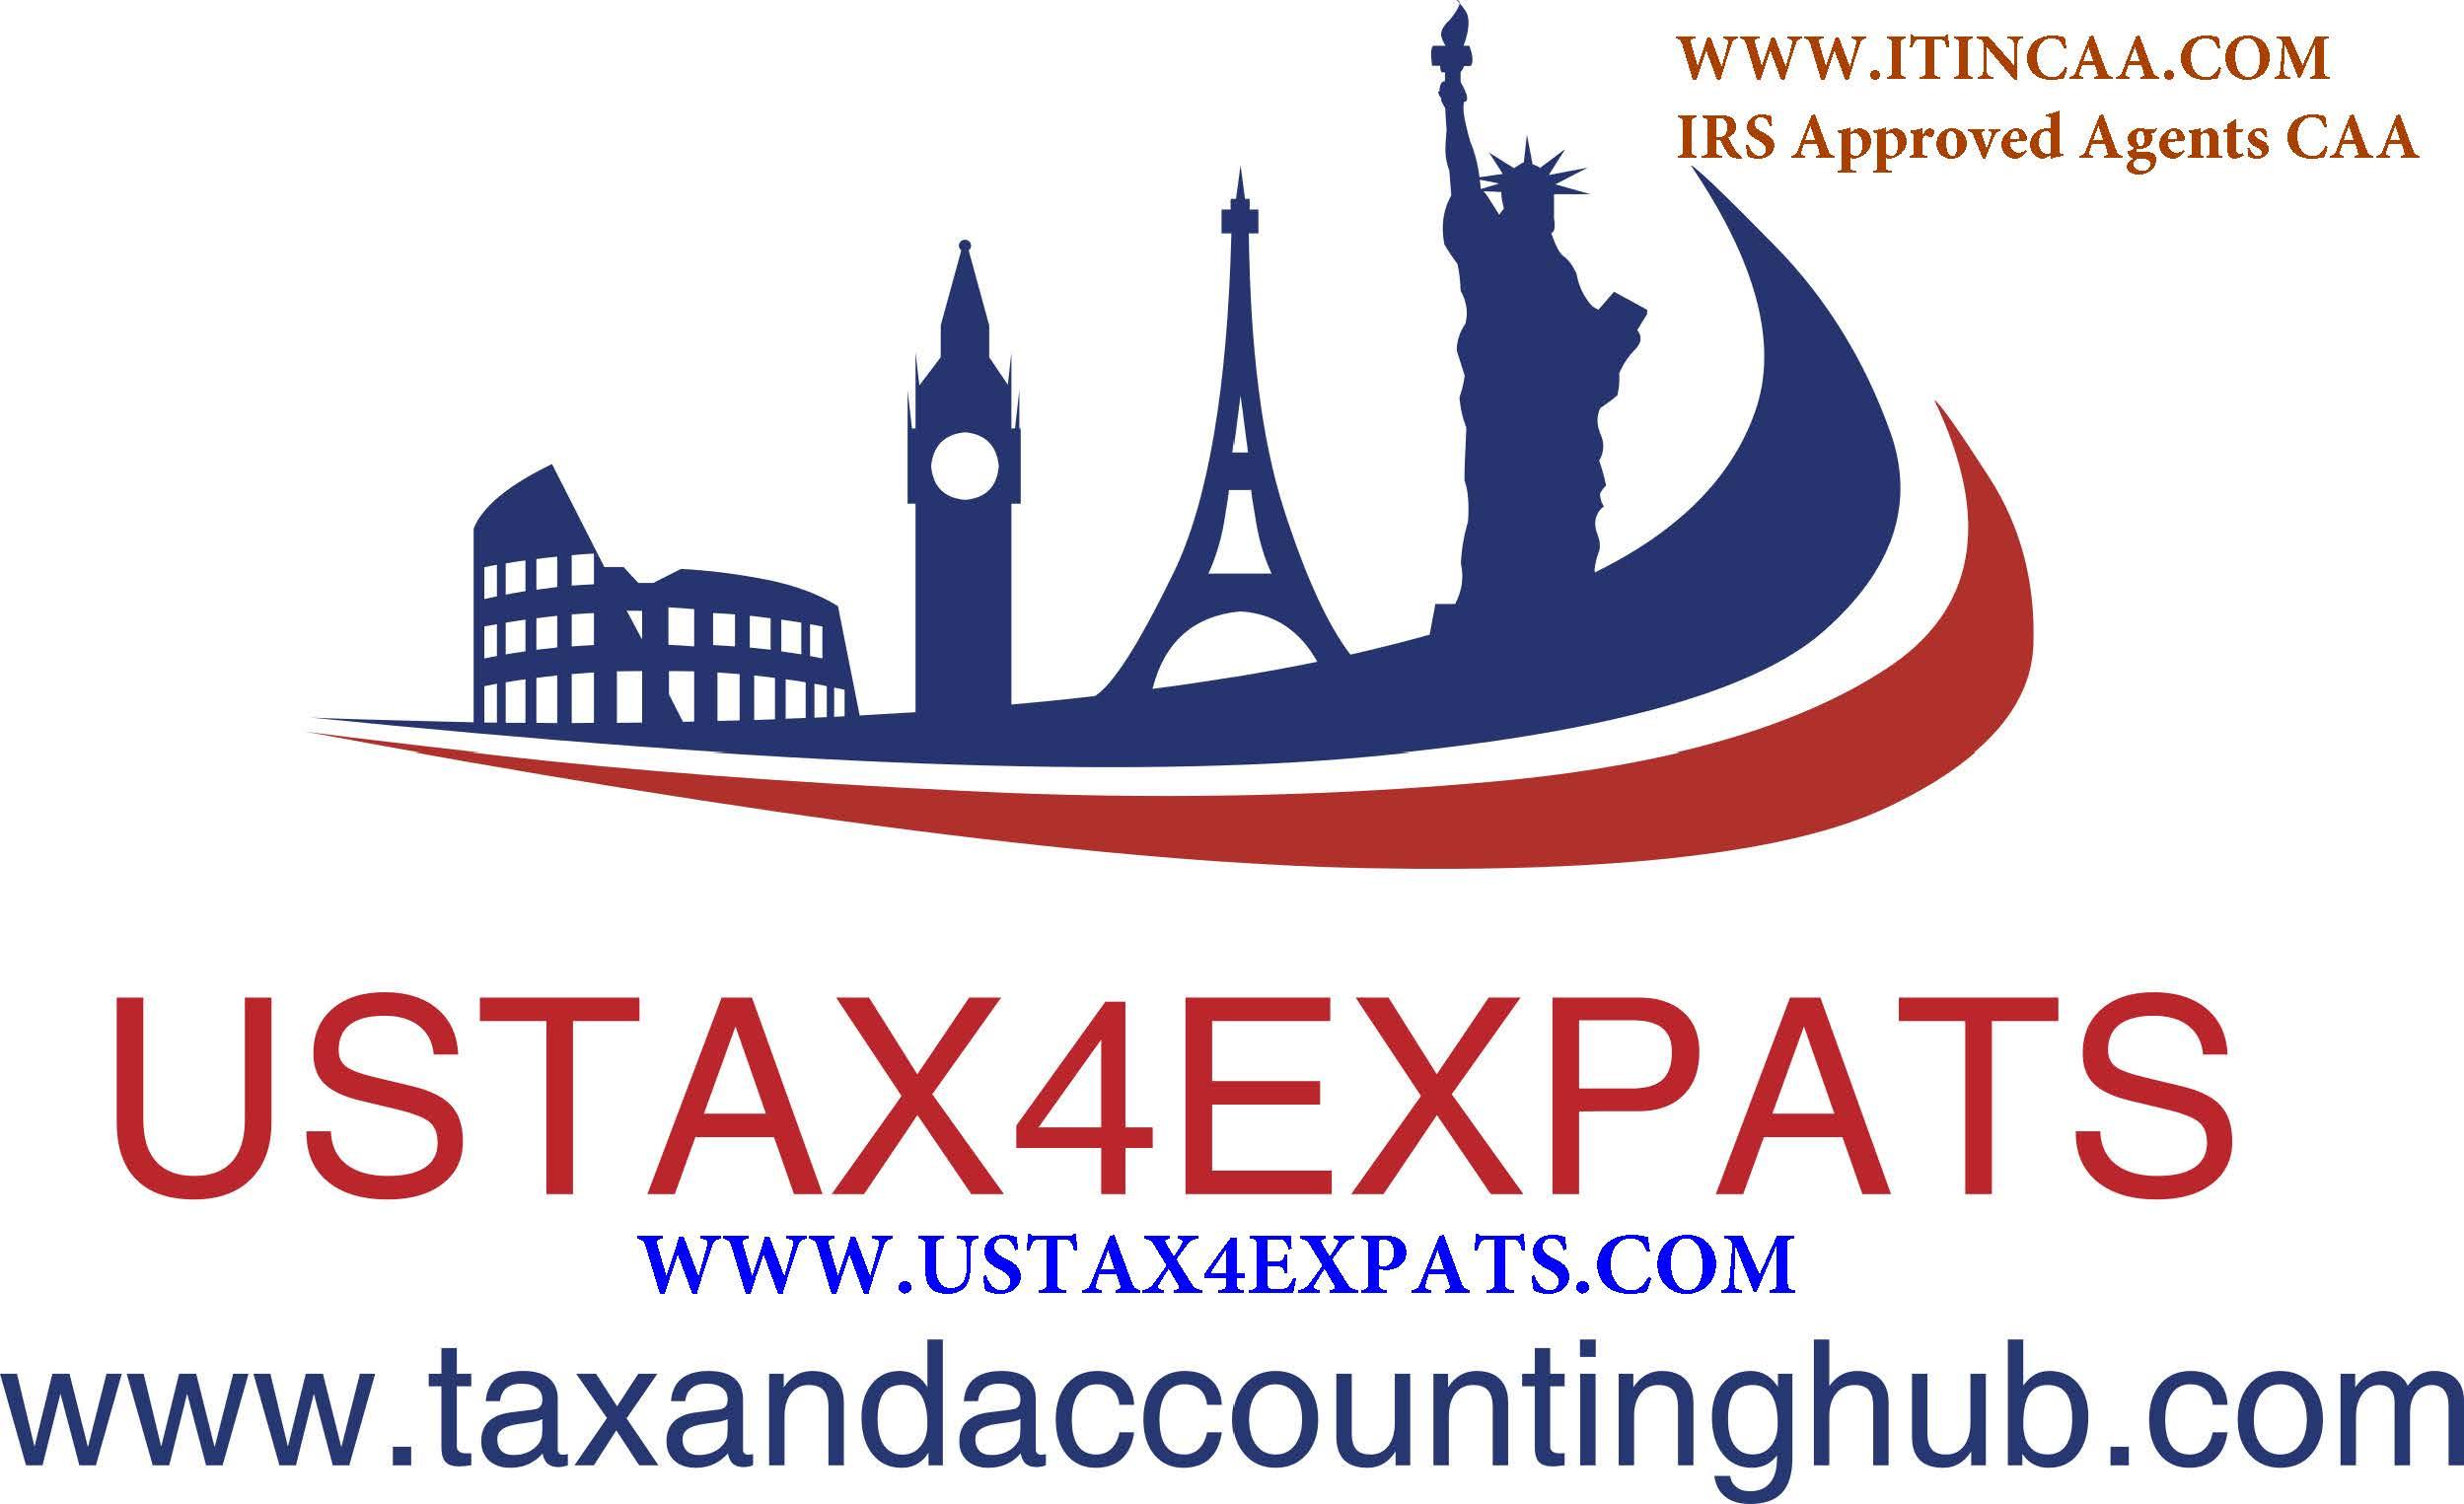 US Tax 4 Expats